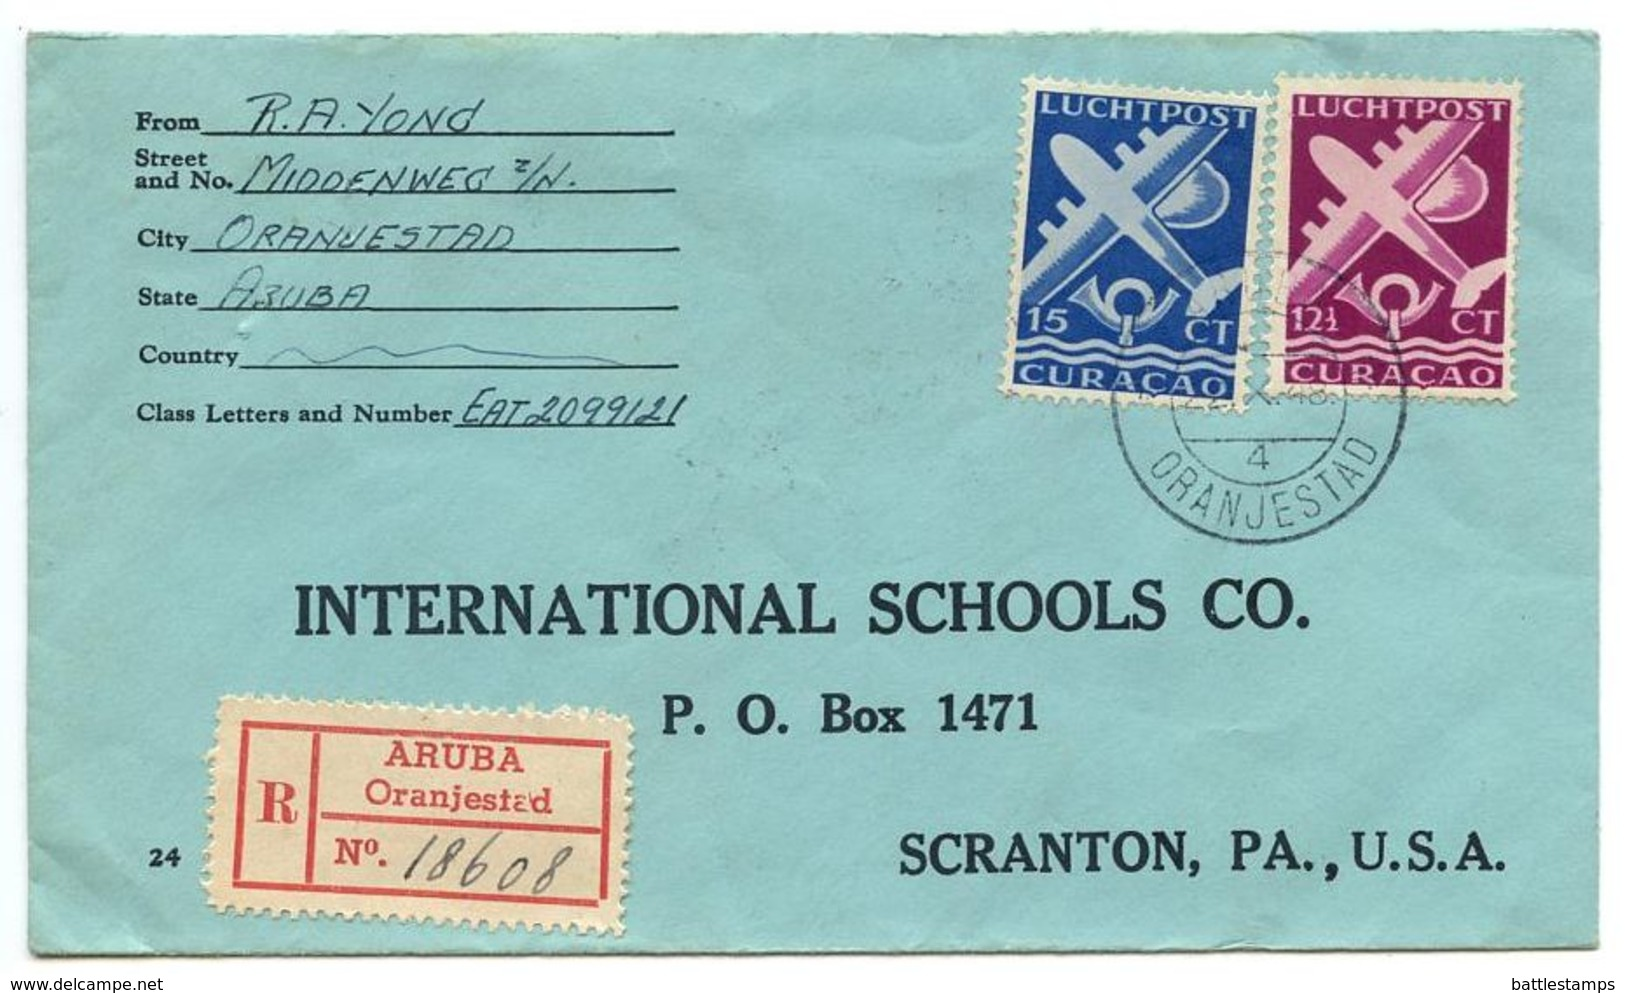 Netherlands Antilles 1948 Airmail Cover Aruba, Oranjestad To U.S. W/ Scott C33A-C34 - Curaçao, Antilles Neérlandaises, Aruba